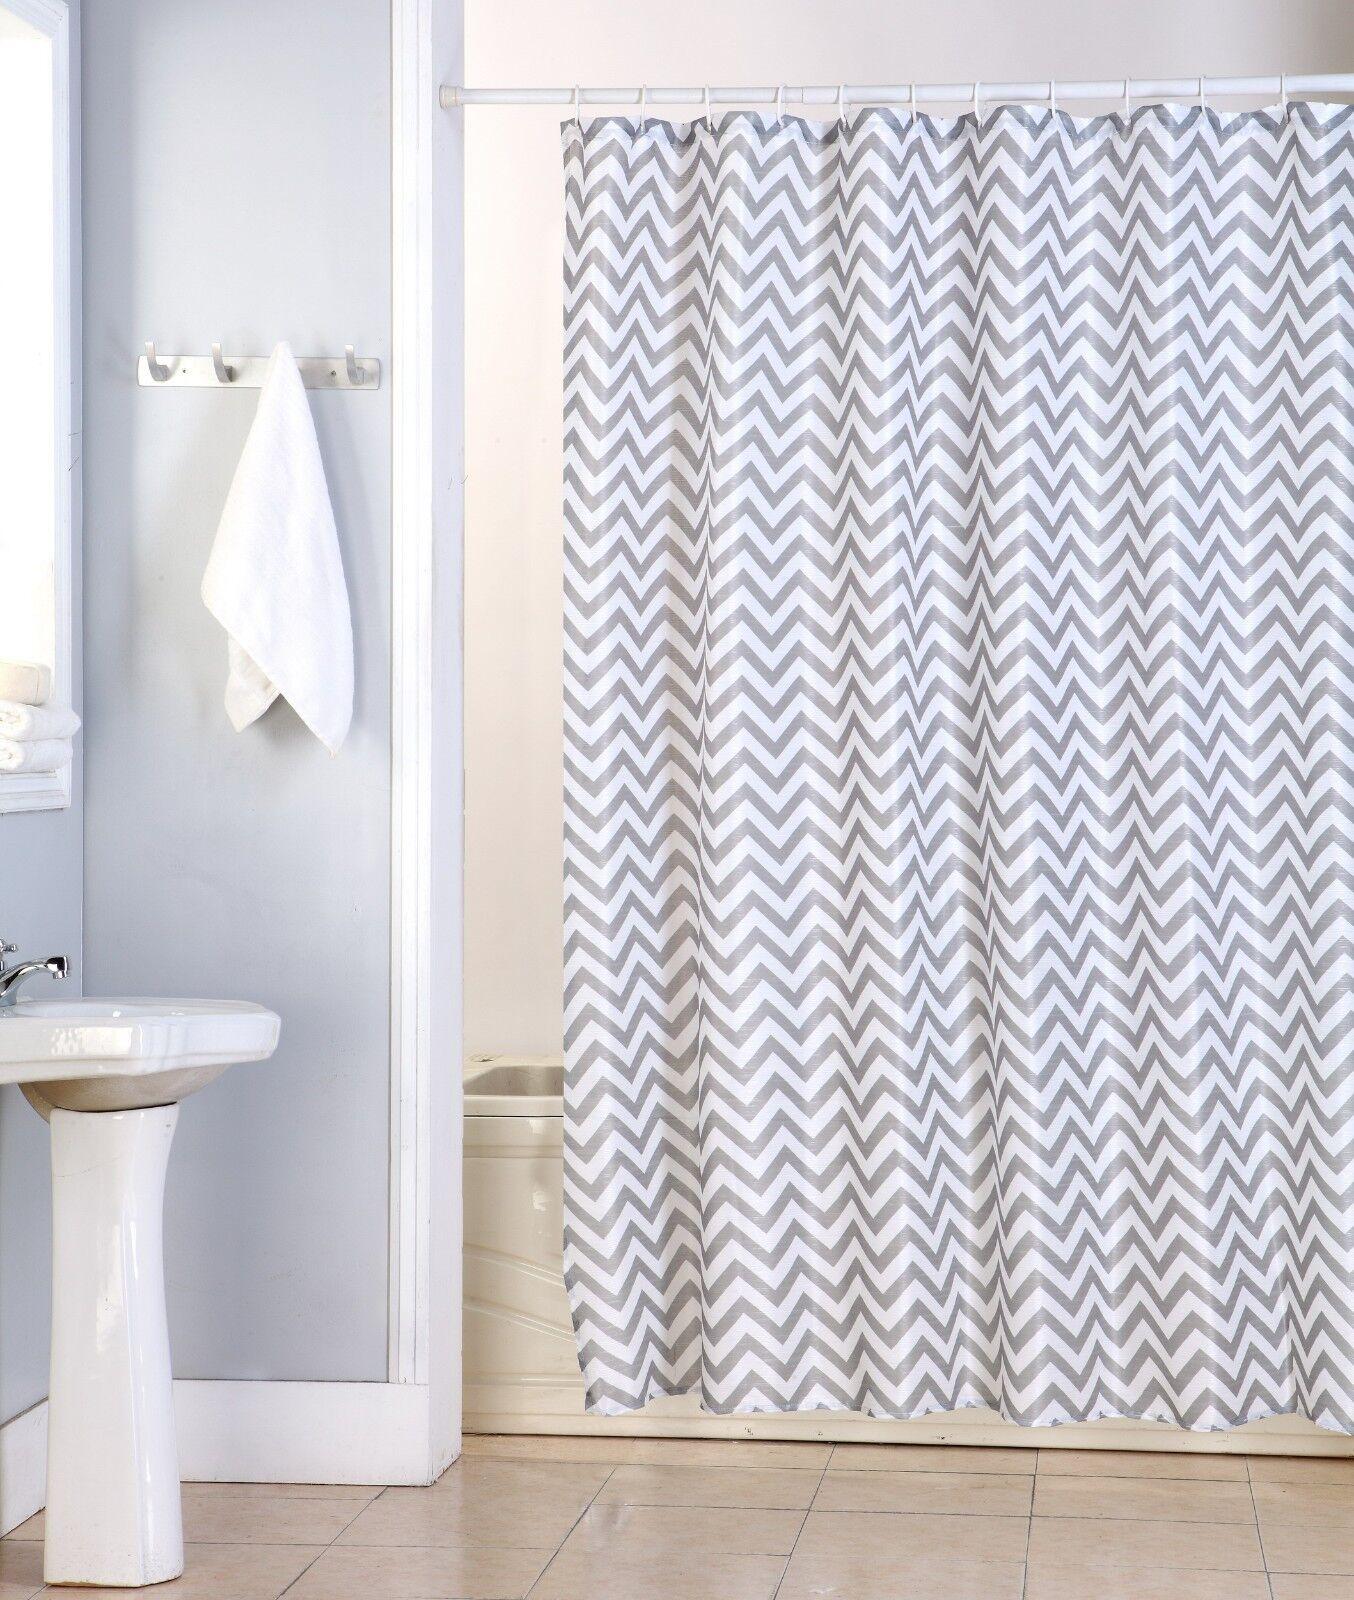 Nikki fabric shower curtain zig zag chevron wave printed for Zig zag bathroom decor